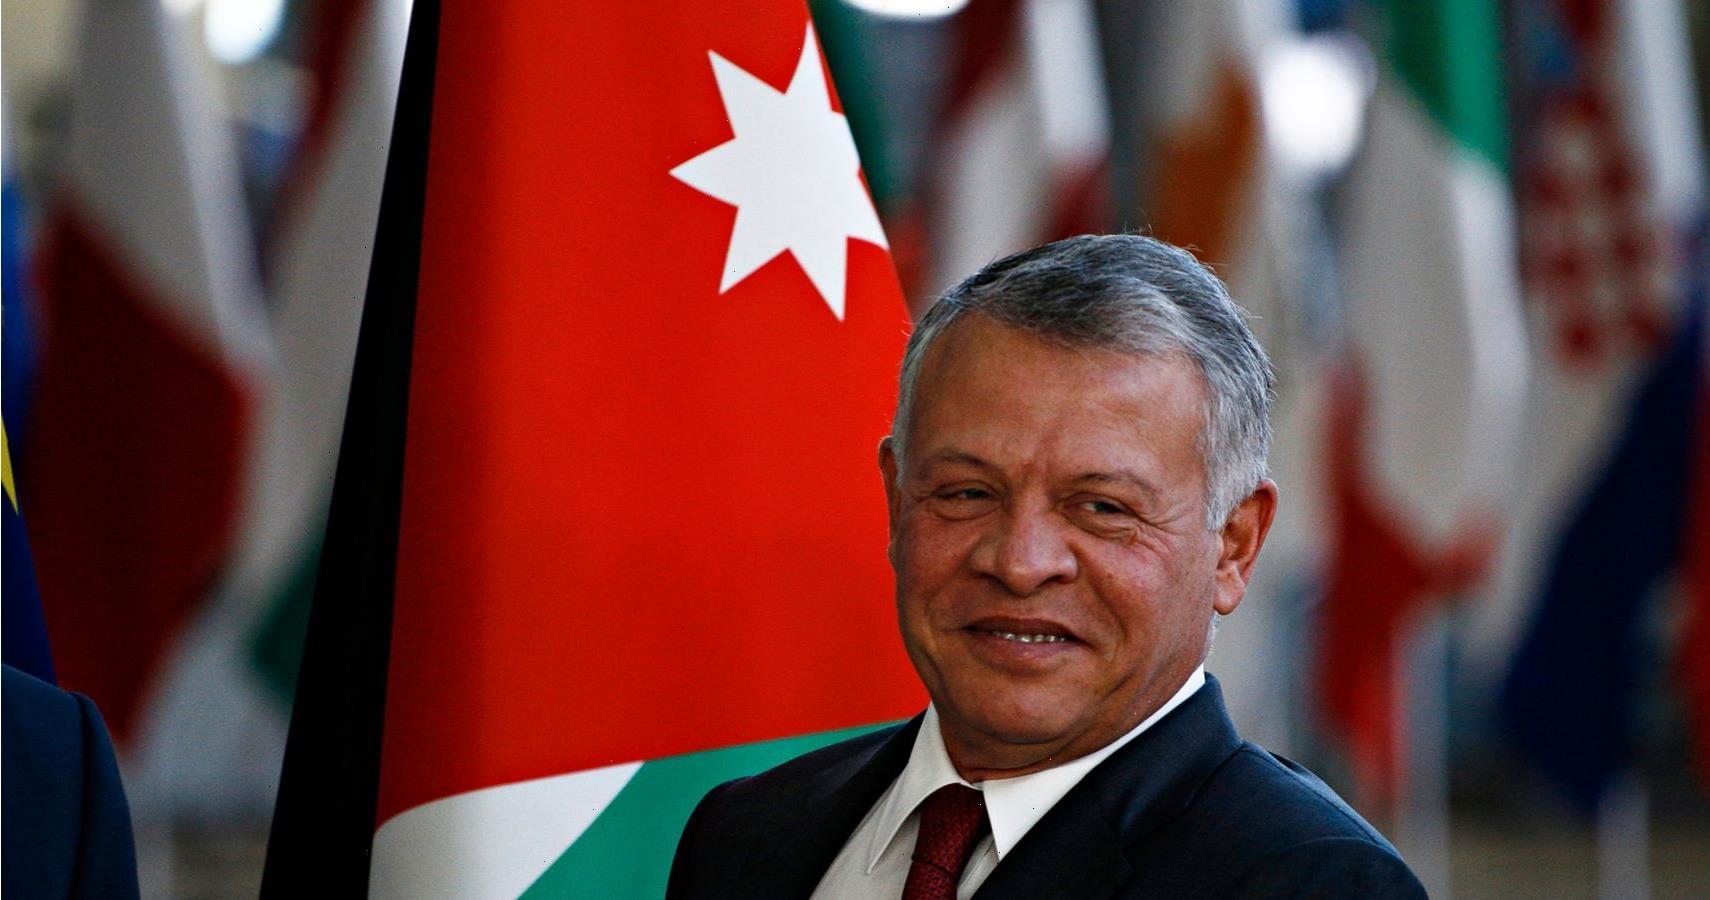 Pandora Papers: King Abdullah IIs Hidden International Luxury Property Empire Worth About $100M Revealed